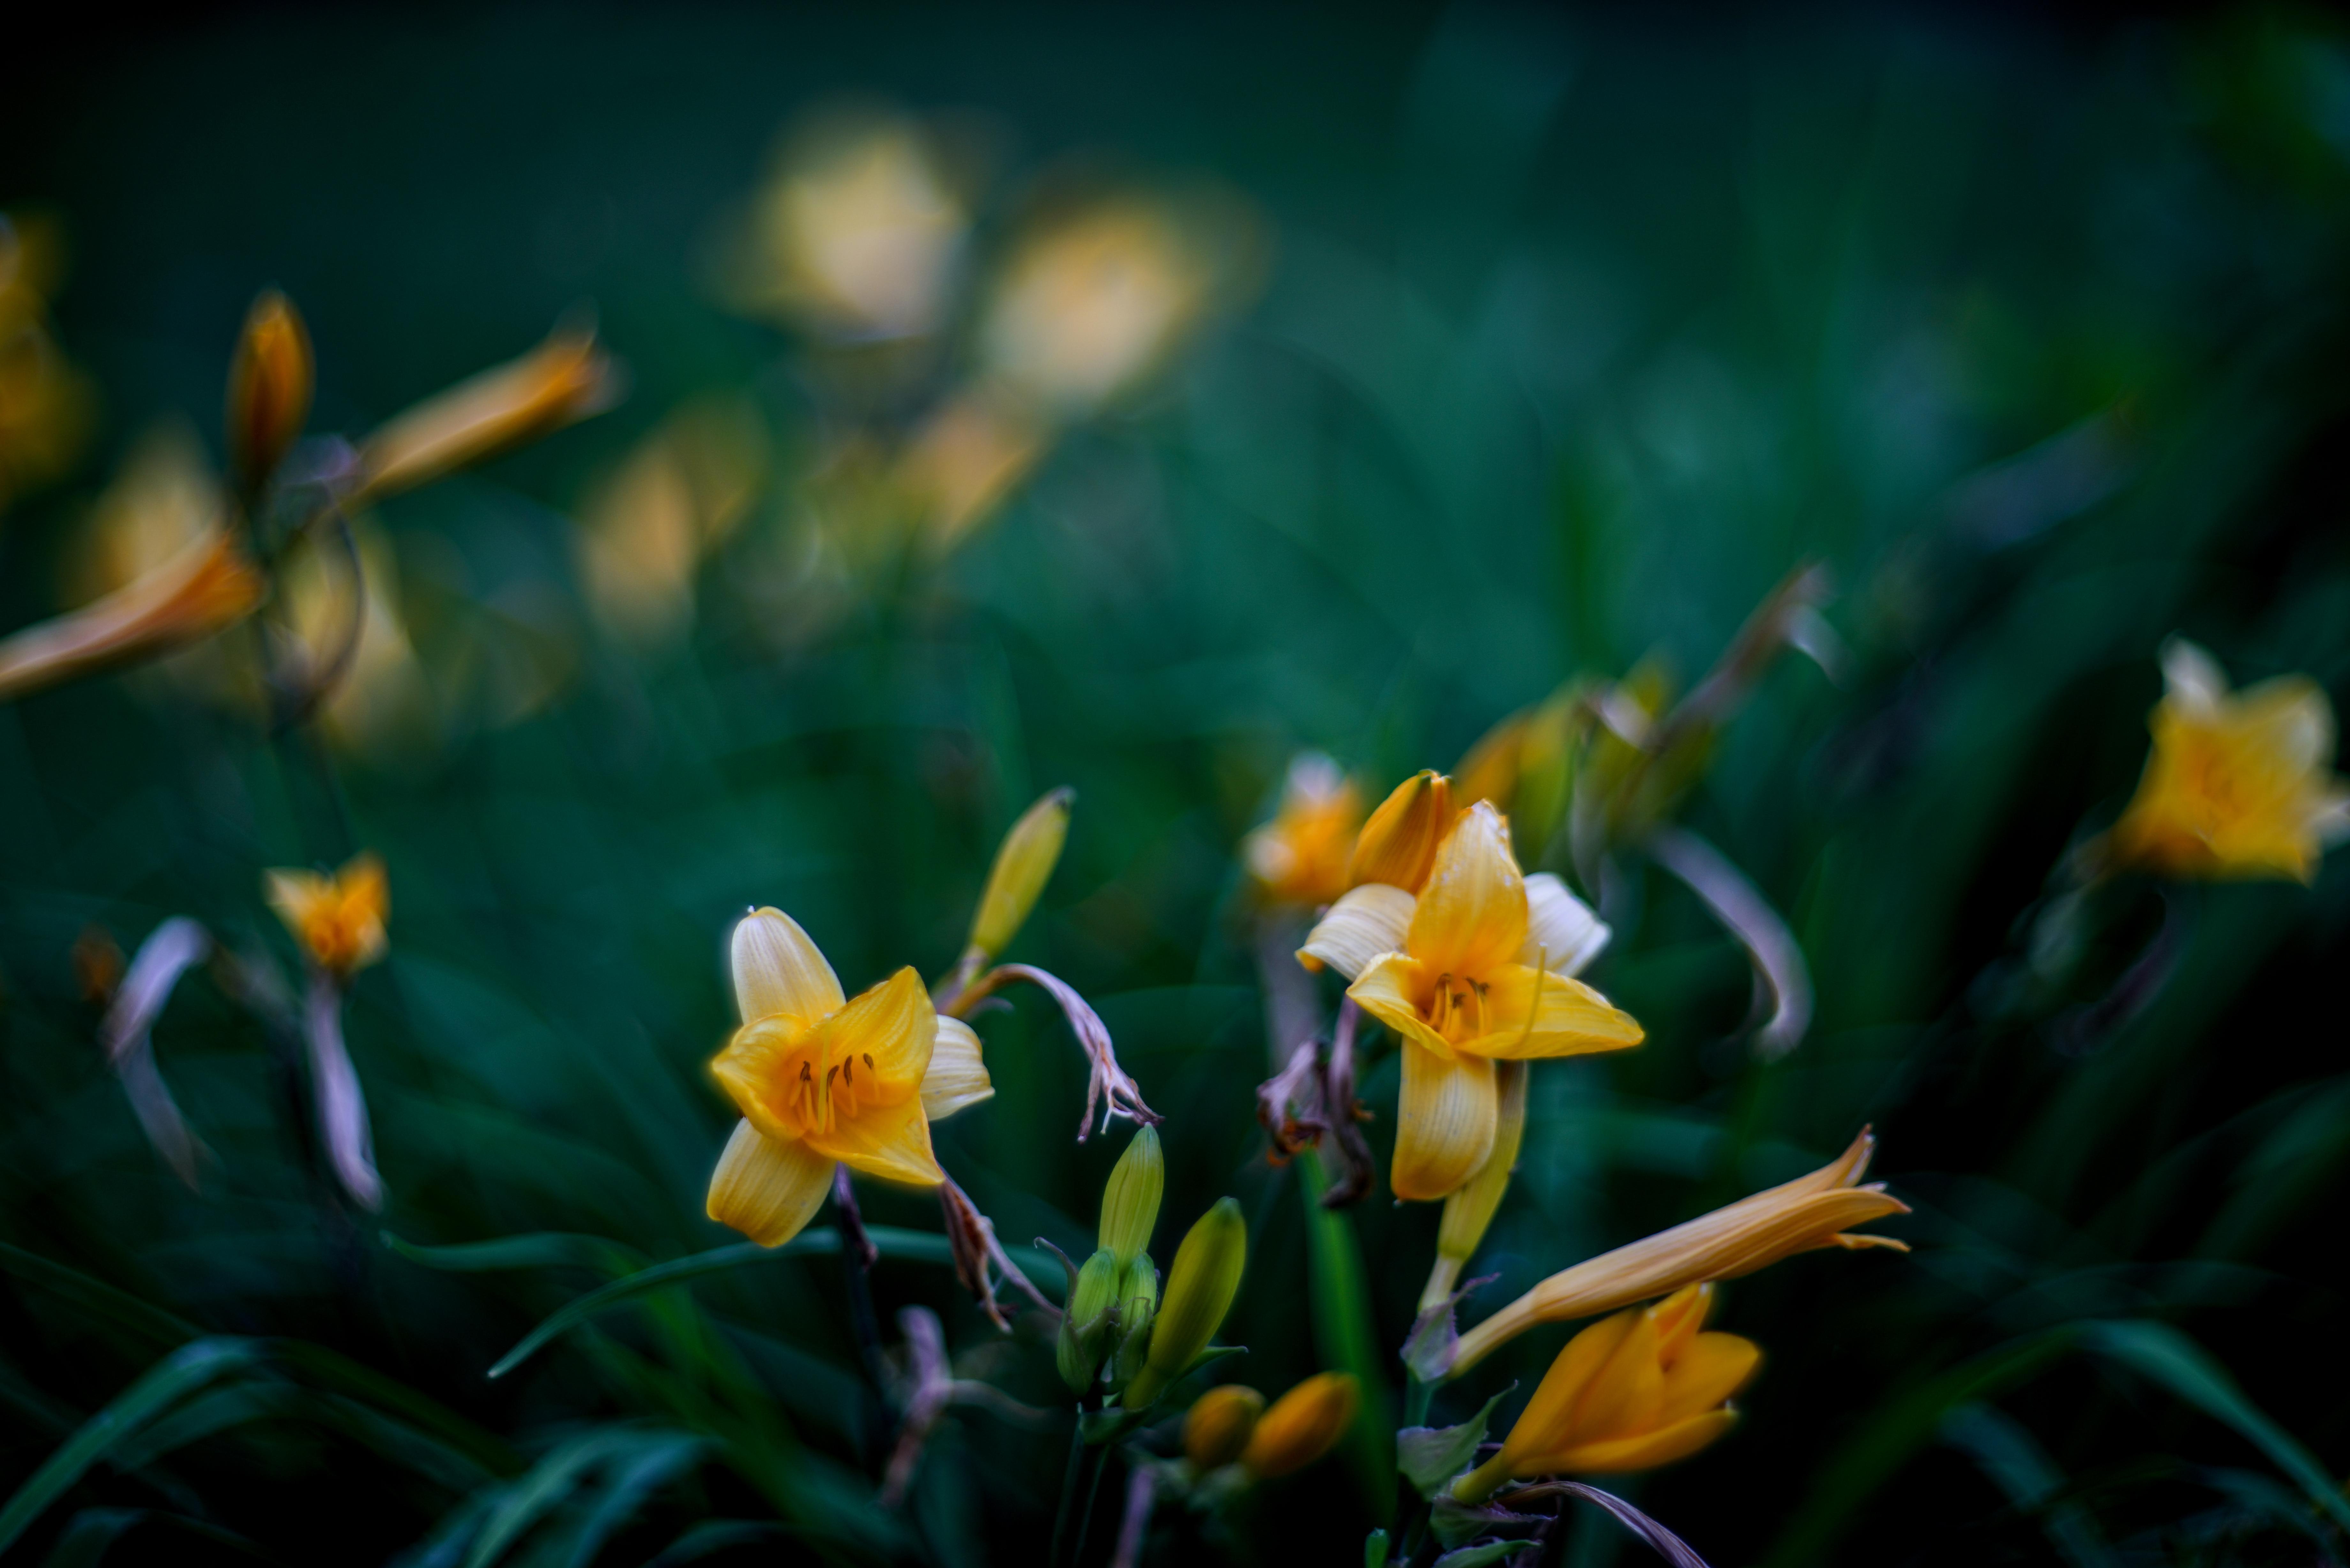 Free Images Nature Bokeh Flower Green Botany Yellow Garden